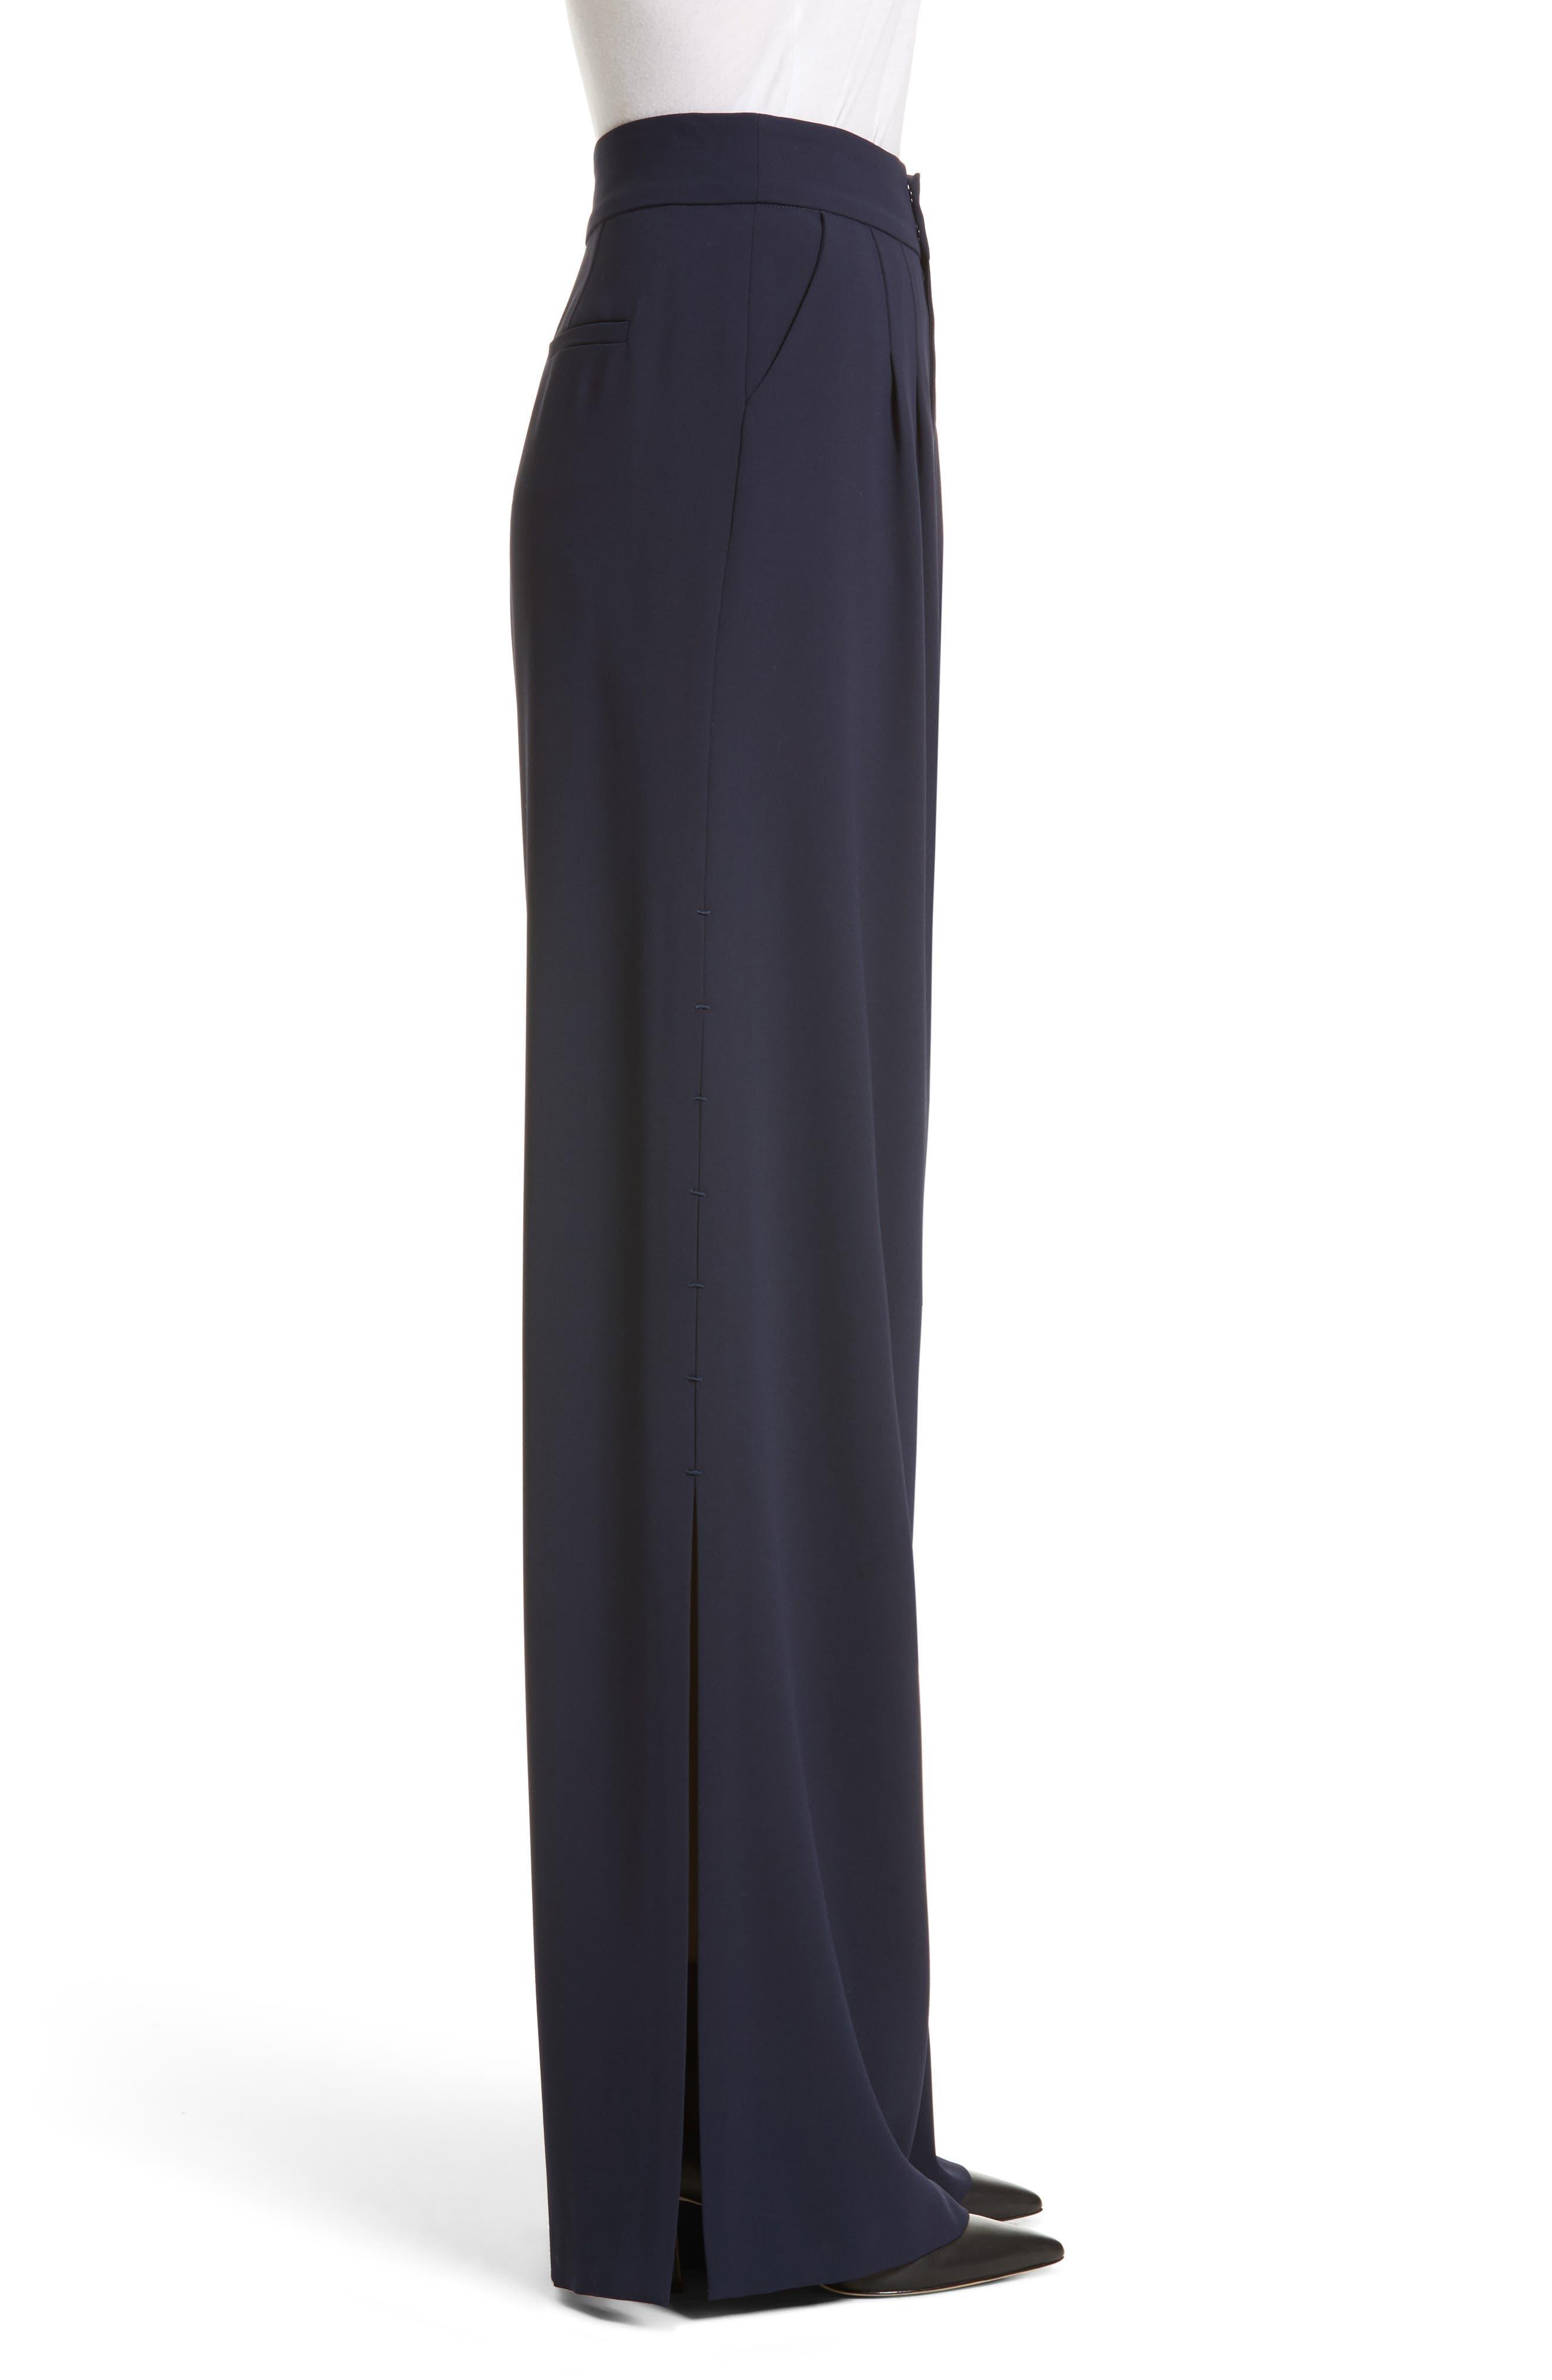 Shavon High Waist Side Slit Flare Pants,                             Alternate thumbnail 3, color,                             400